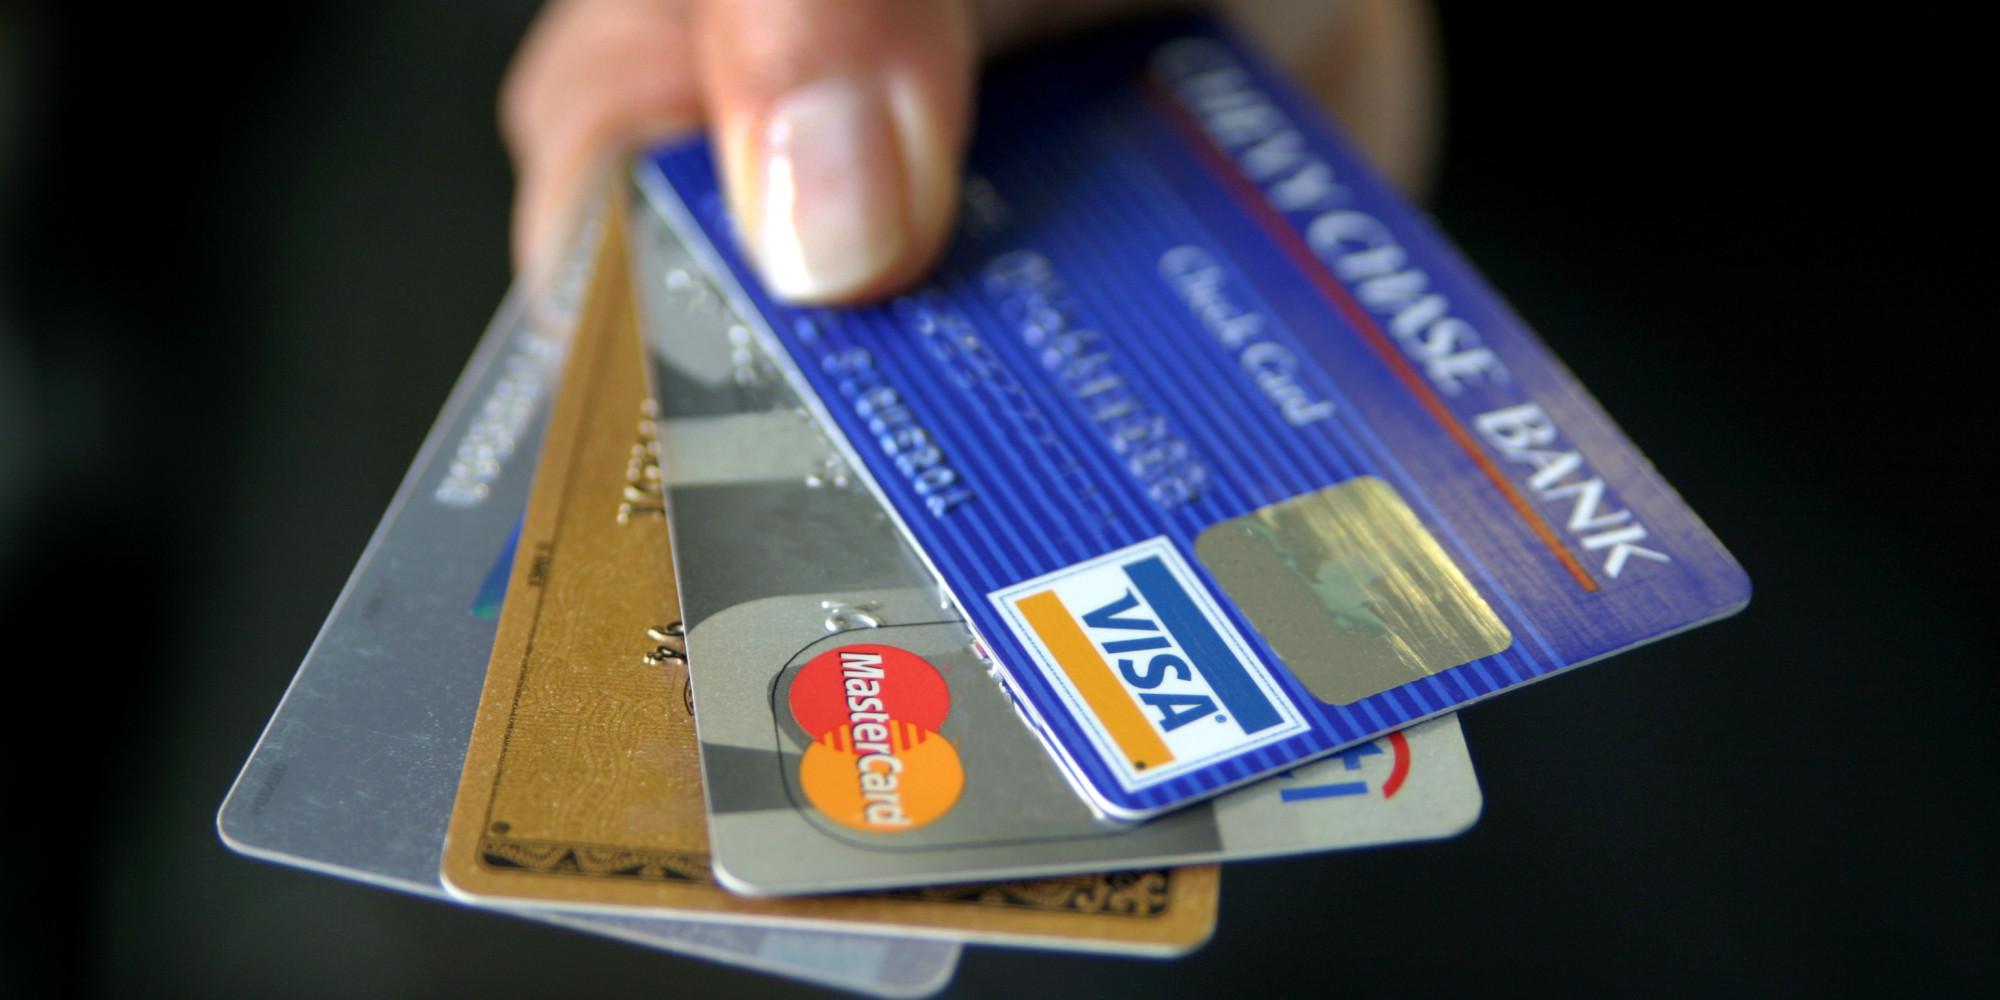 People love their debit cards: a big mistake - Michael Smeriglio